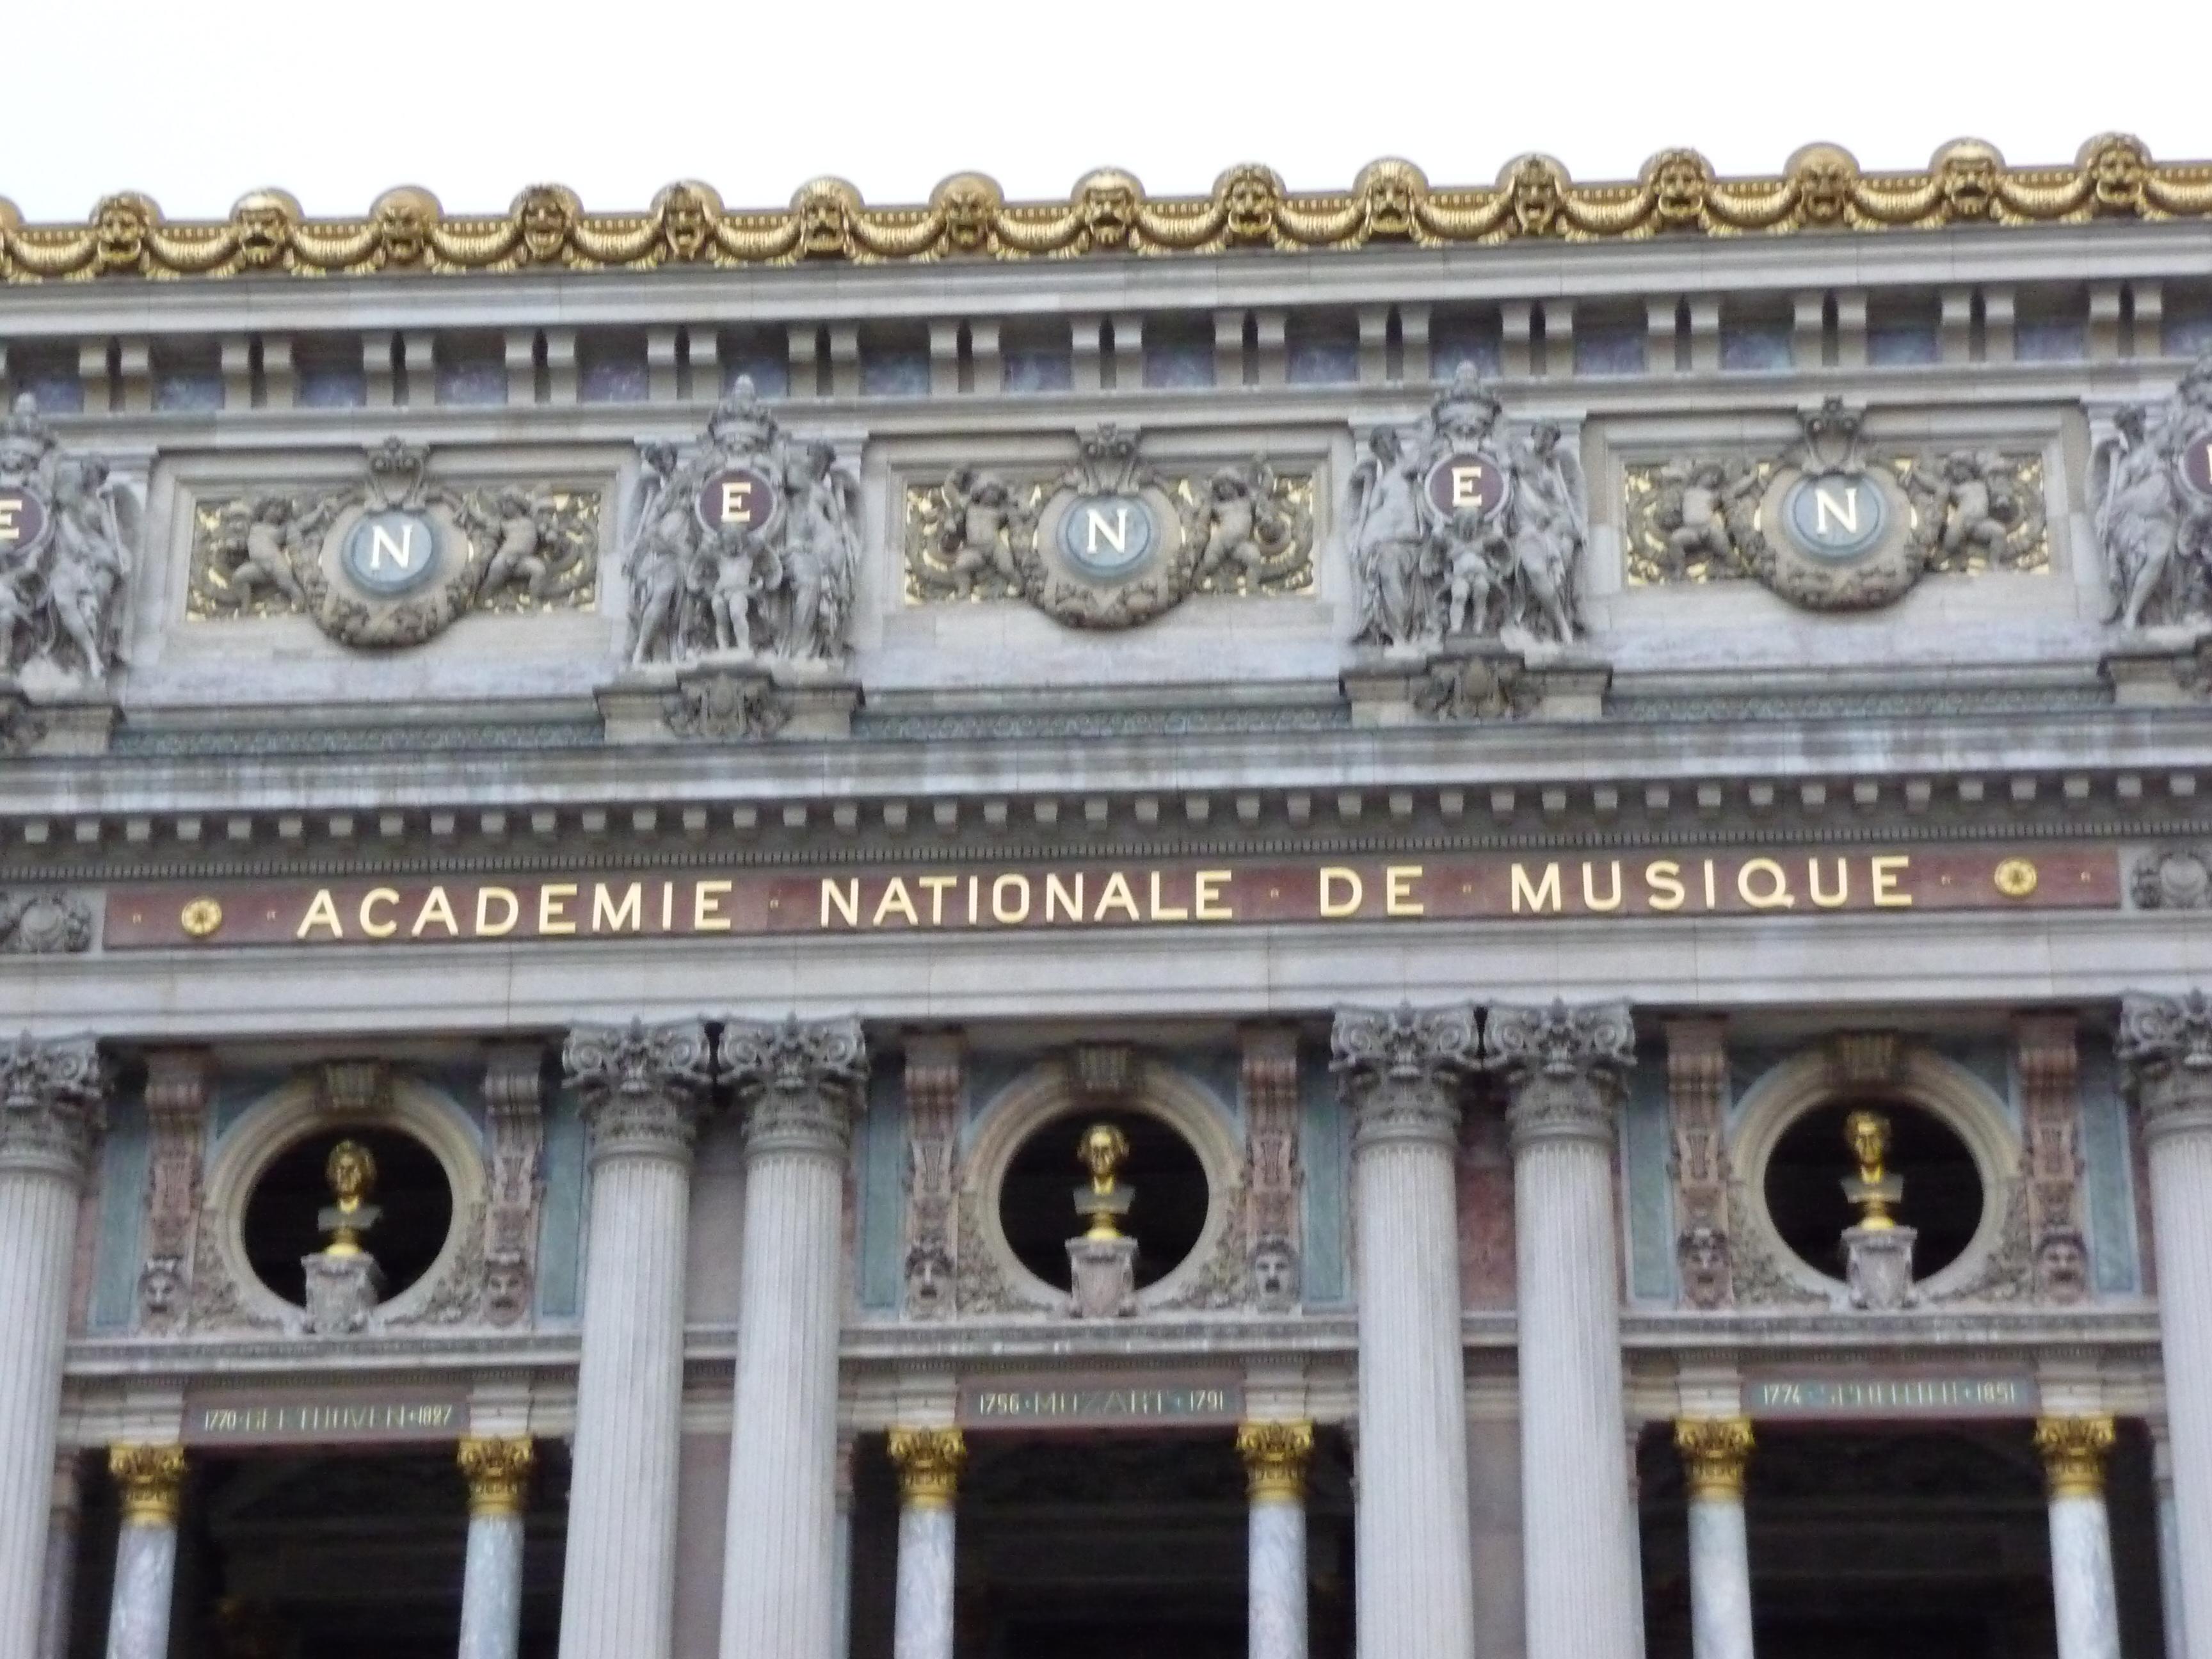 opéra garnier, opéra garnier paris, visite opéra, visite opéra garnier, visite opéra garnier paris